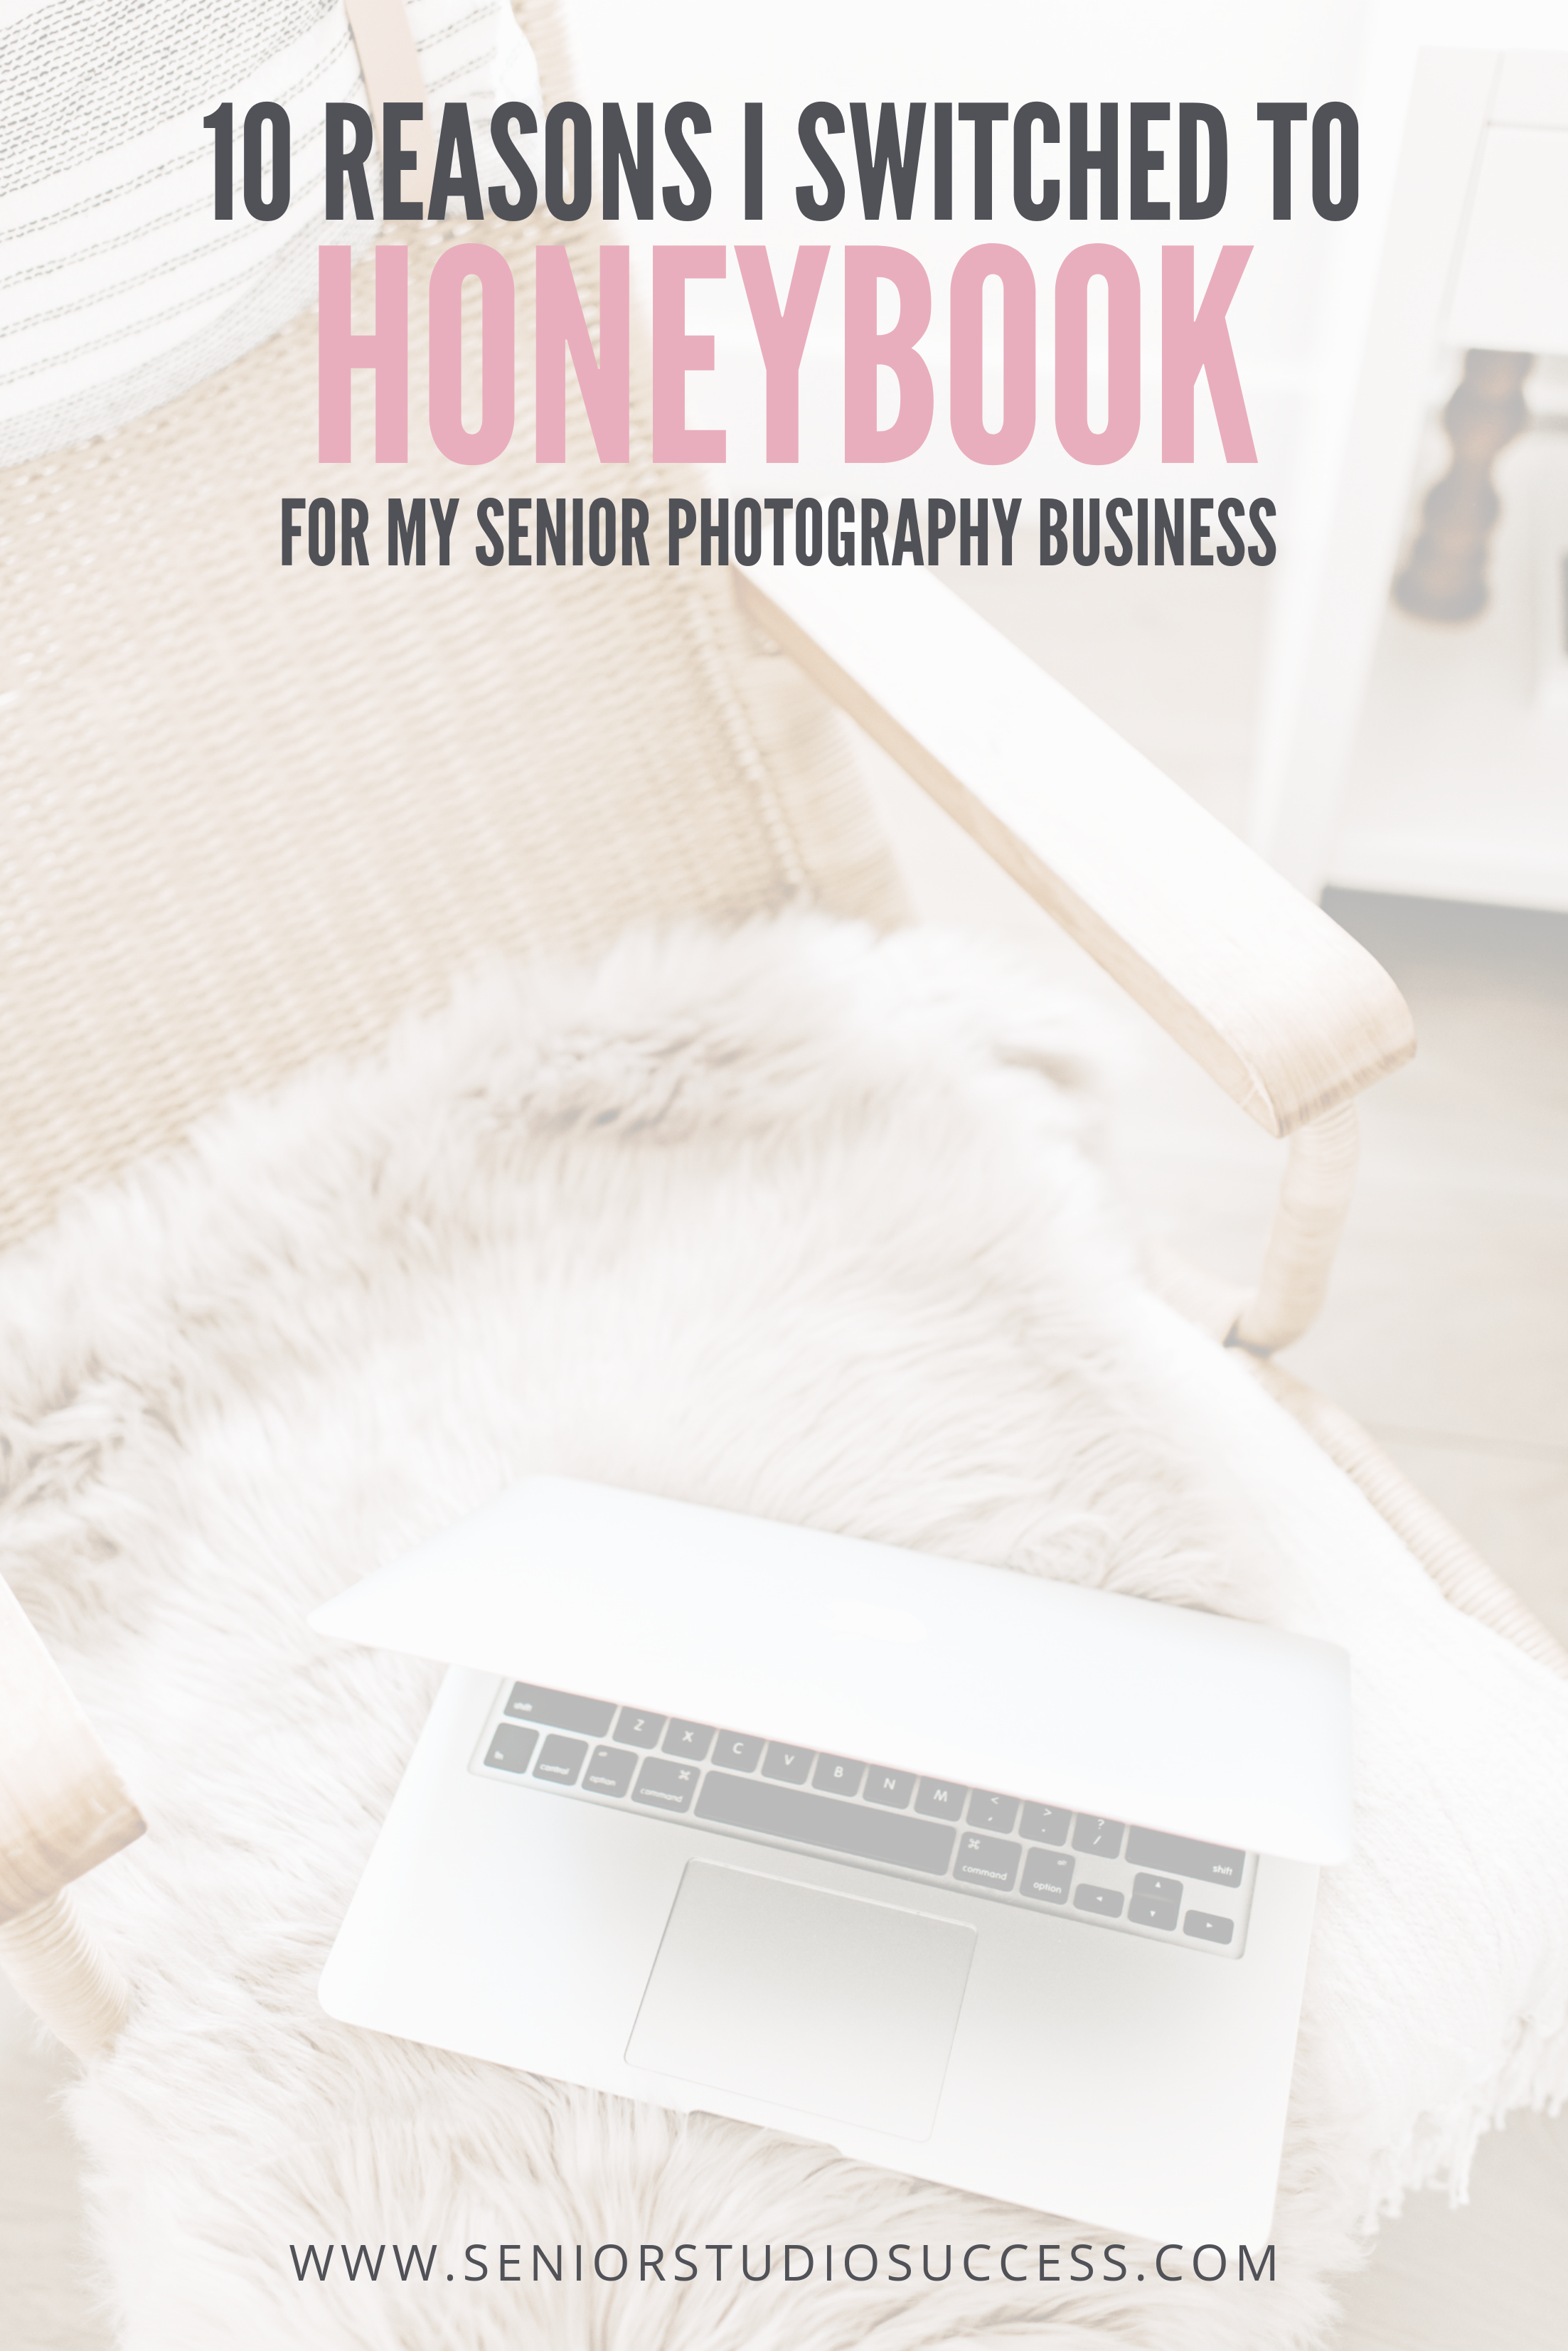 honeybook client management software for senior photographers